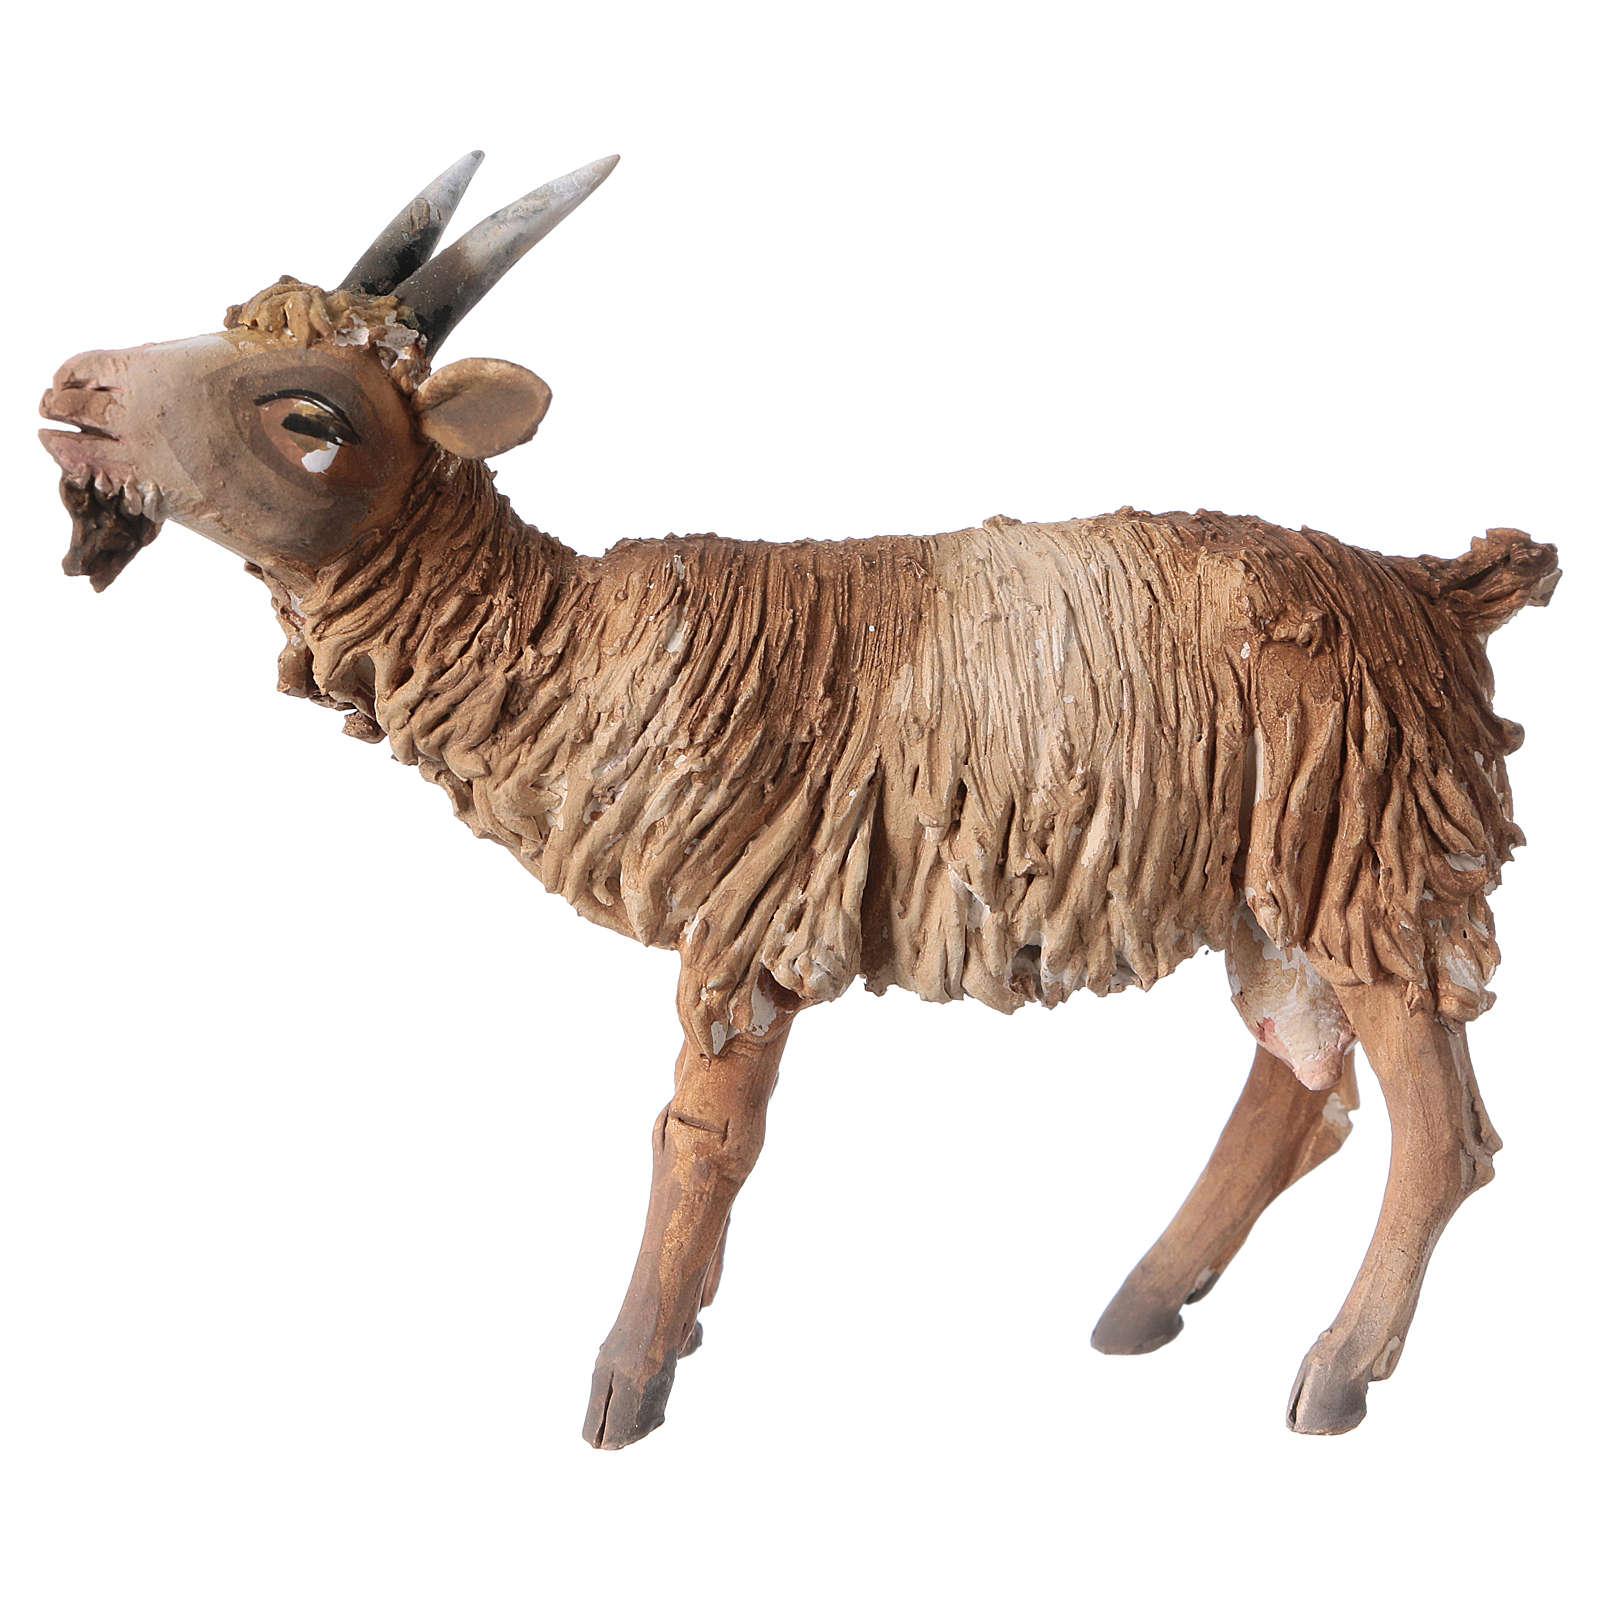 Cabra con cabeza baja Belén 13 cm Angela Tripi terracota 4